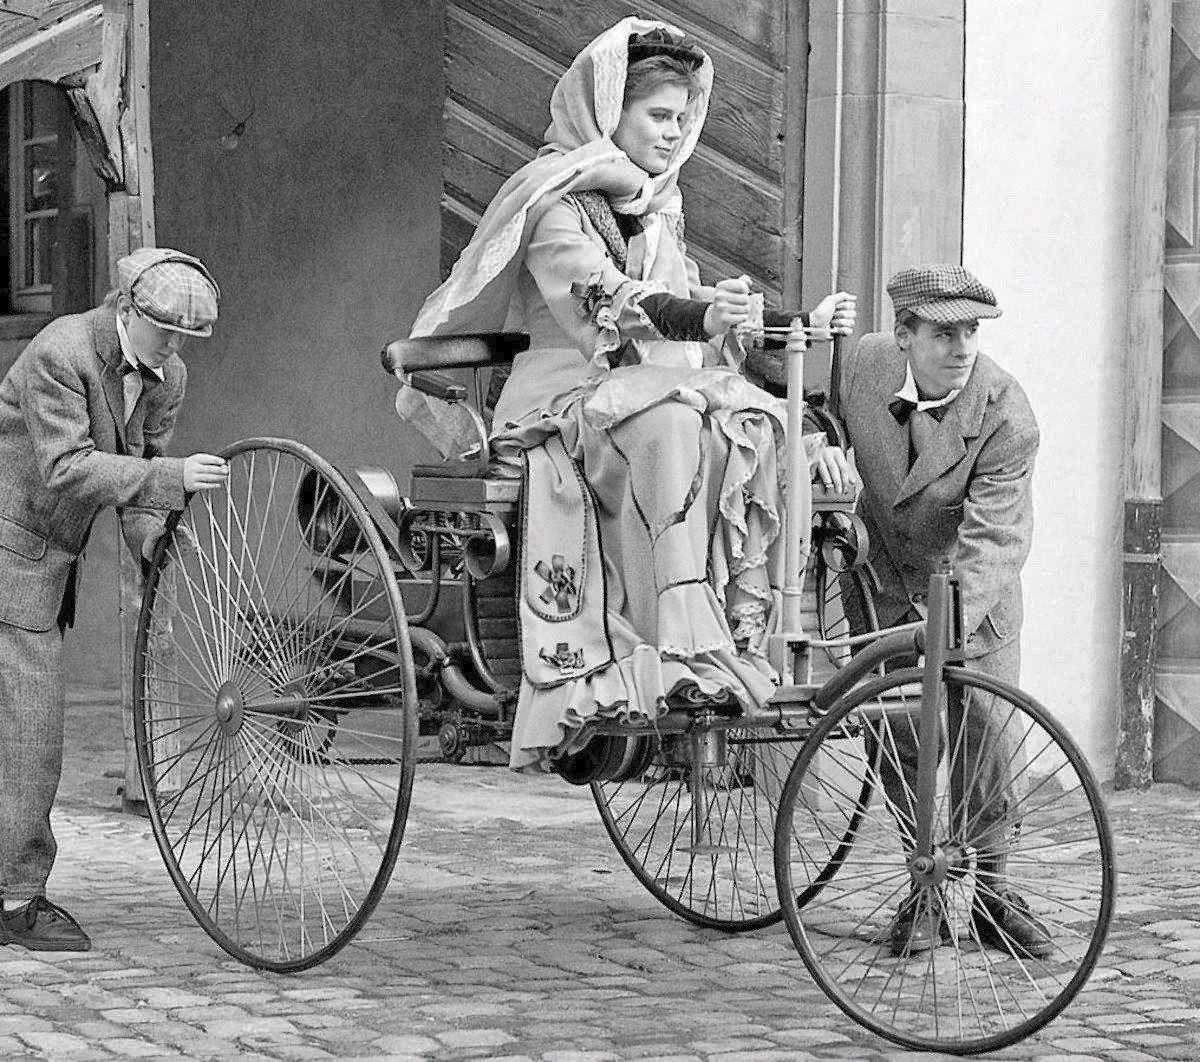 The World S First Automobile The Benz Patent Motorwagen: Bertha Benz, Mujer Pionera En El Mundo Del Automóvil